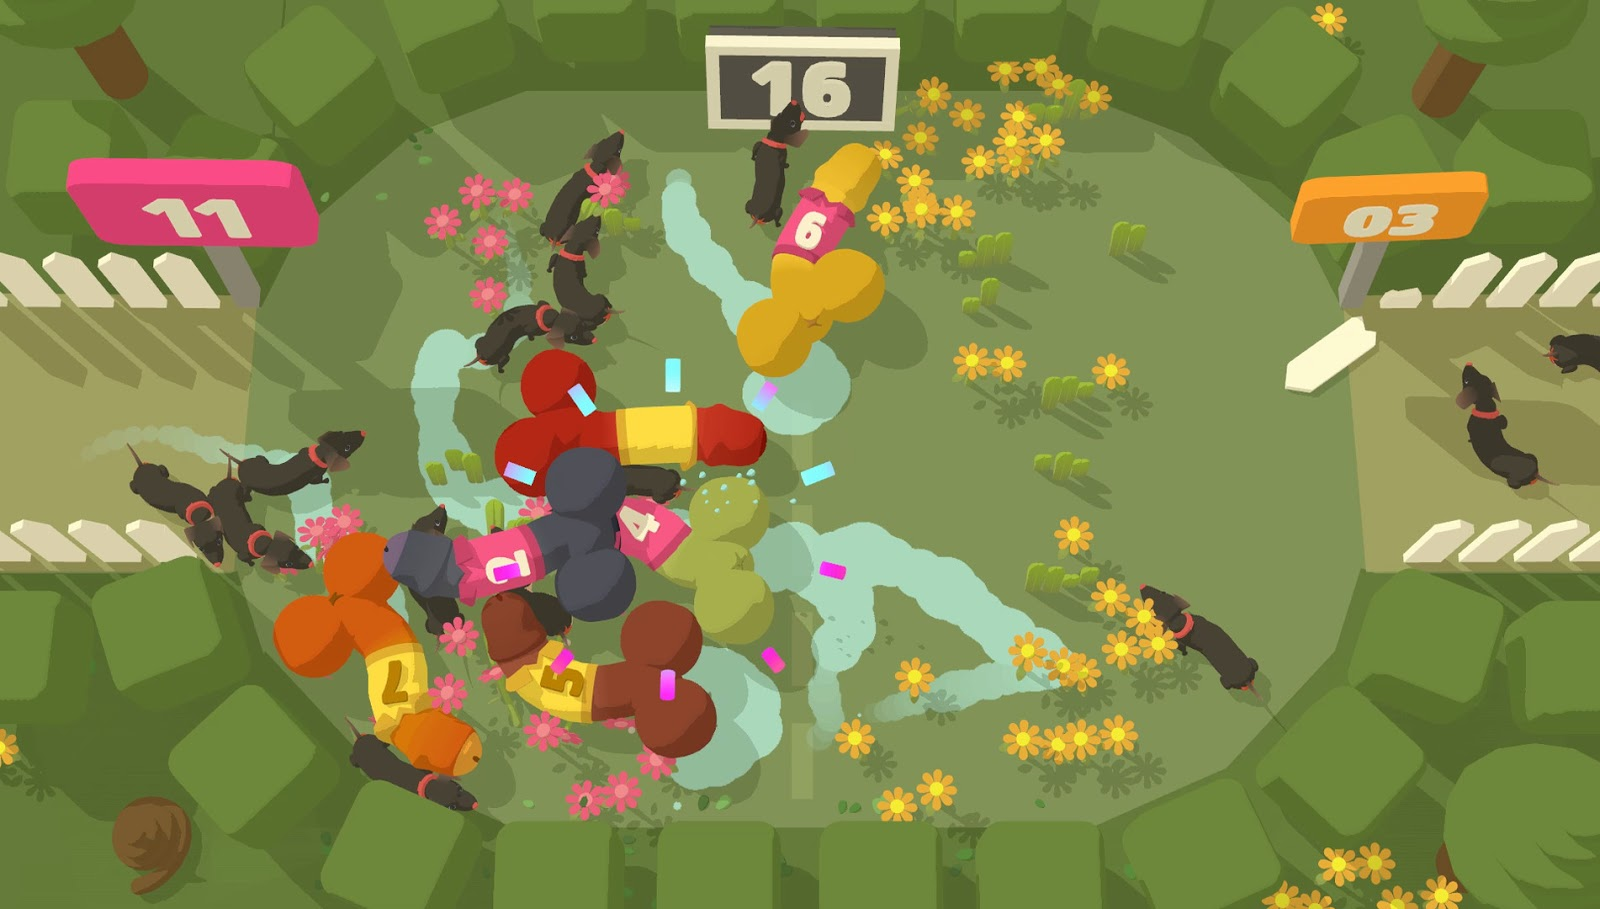 genital jousting game